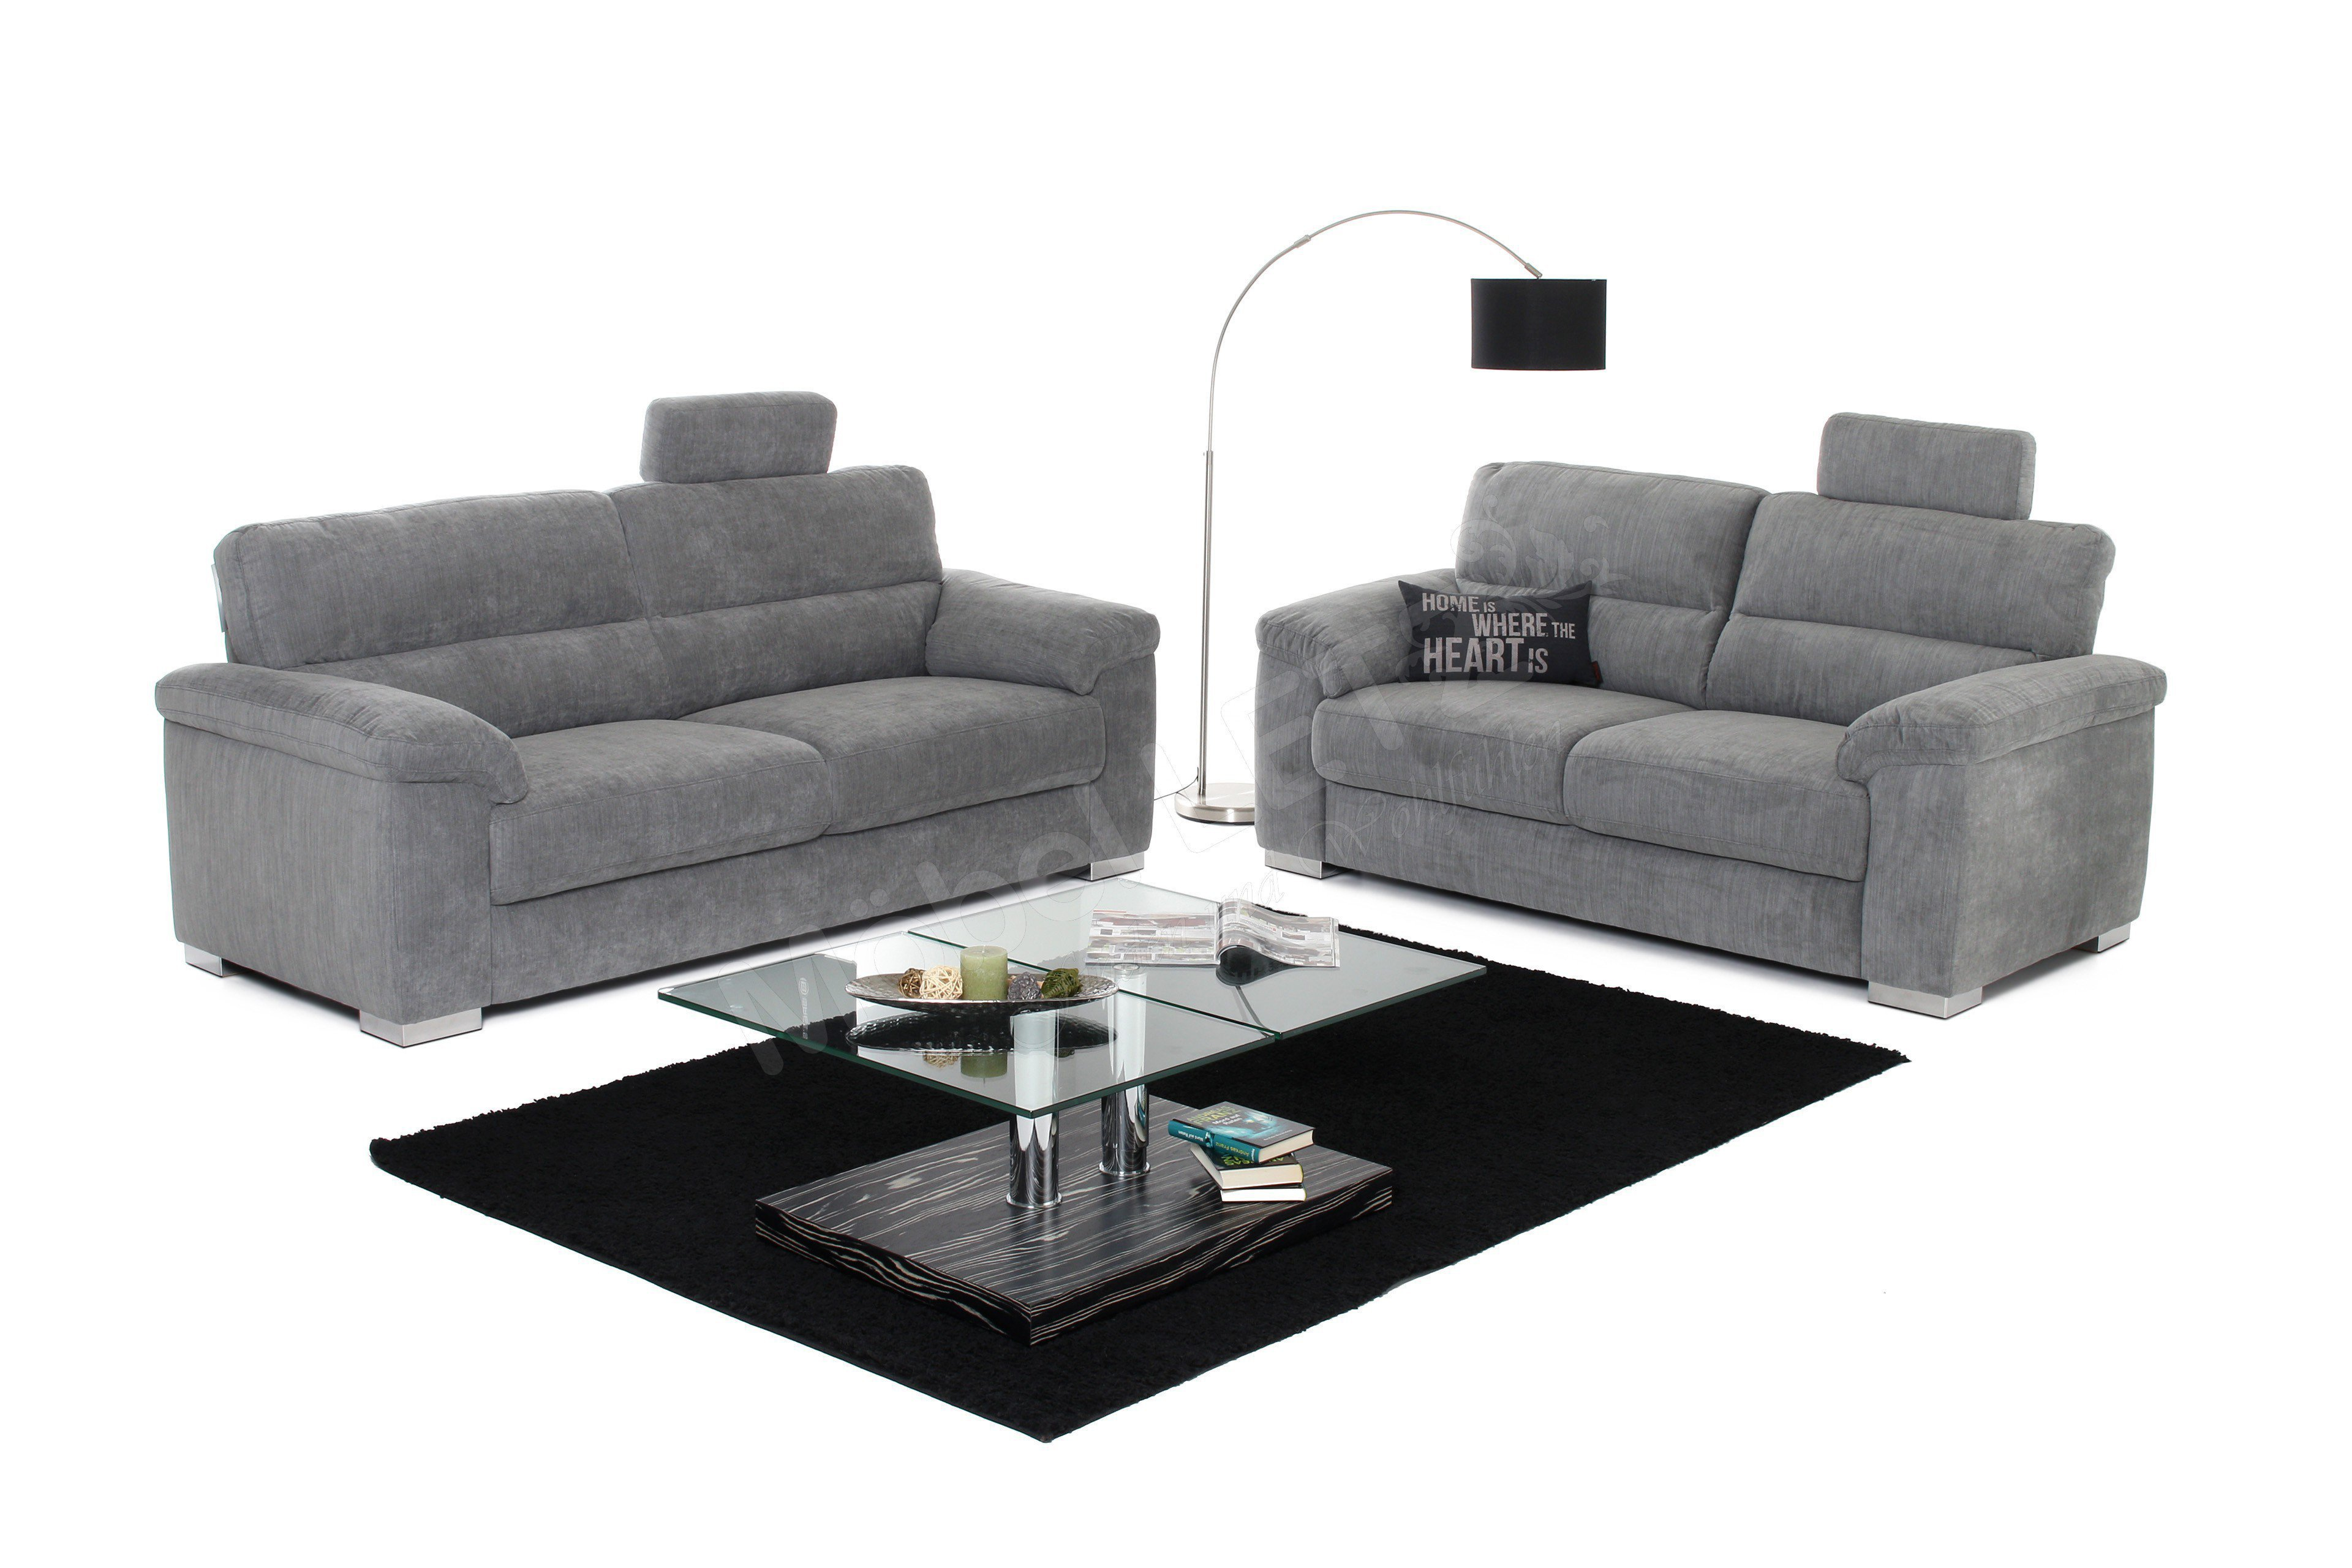 mbel polen online kaufen mbel polen online kaufen with. Black Bedroom Furniture Sets. Home Design Ideas